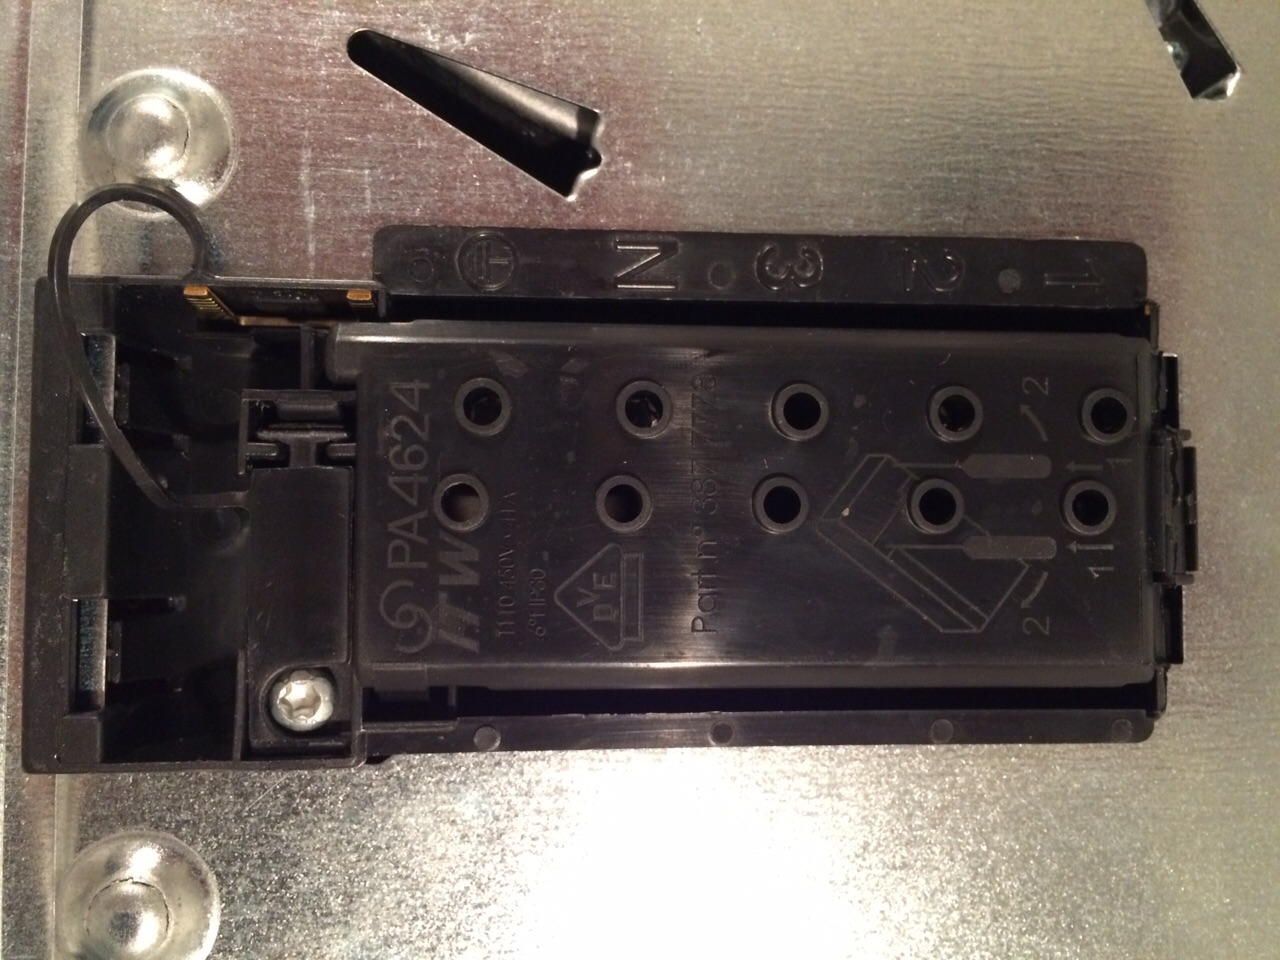 Hot Plate Wiring Diagram